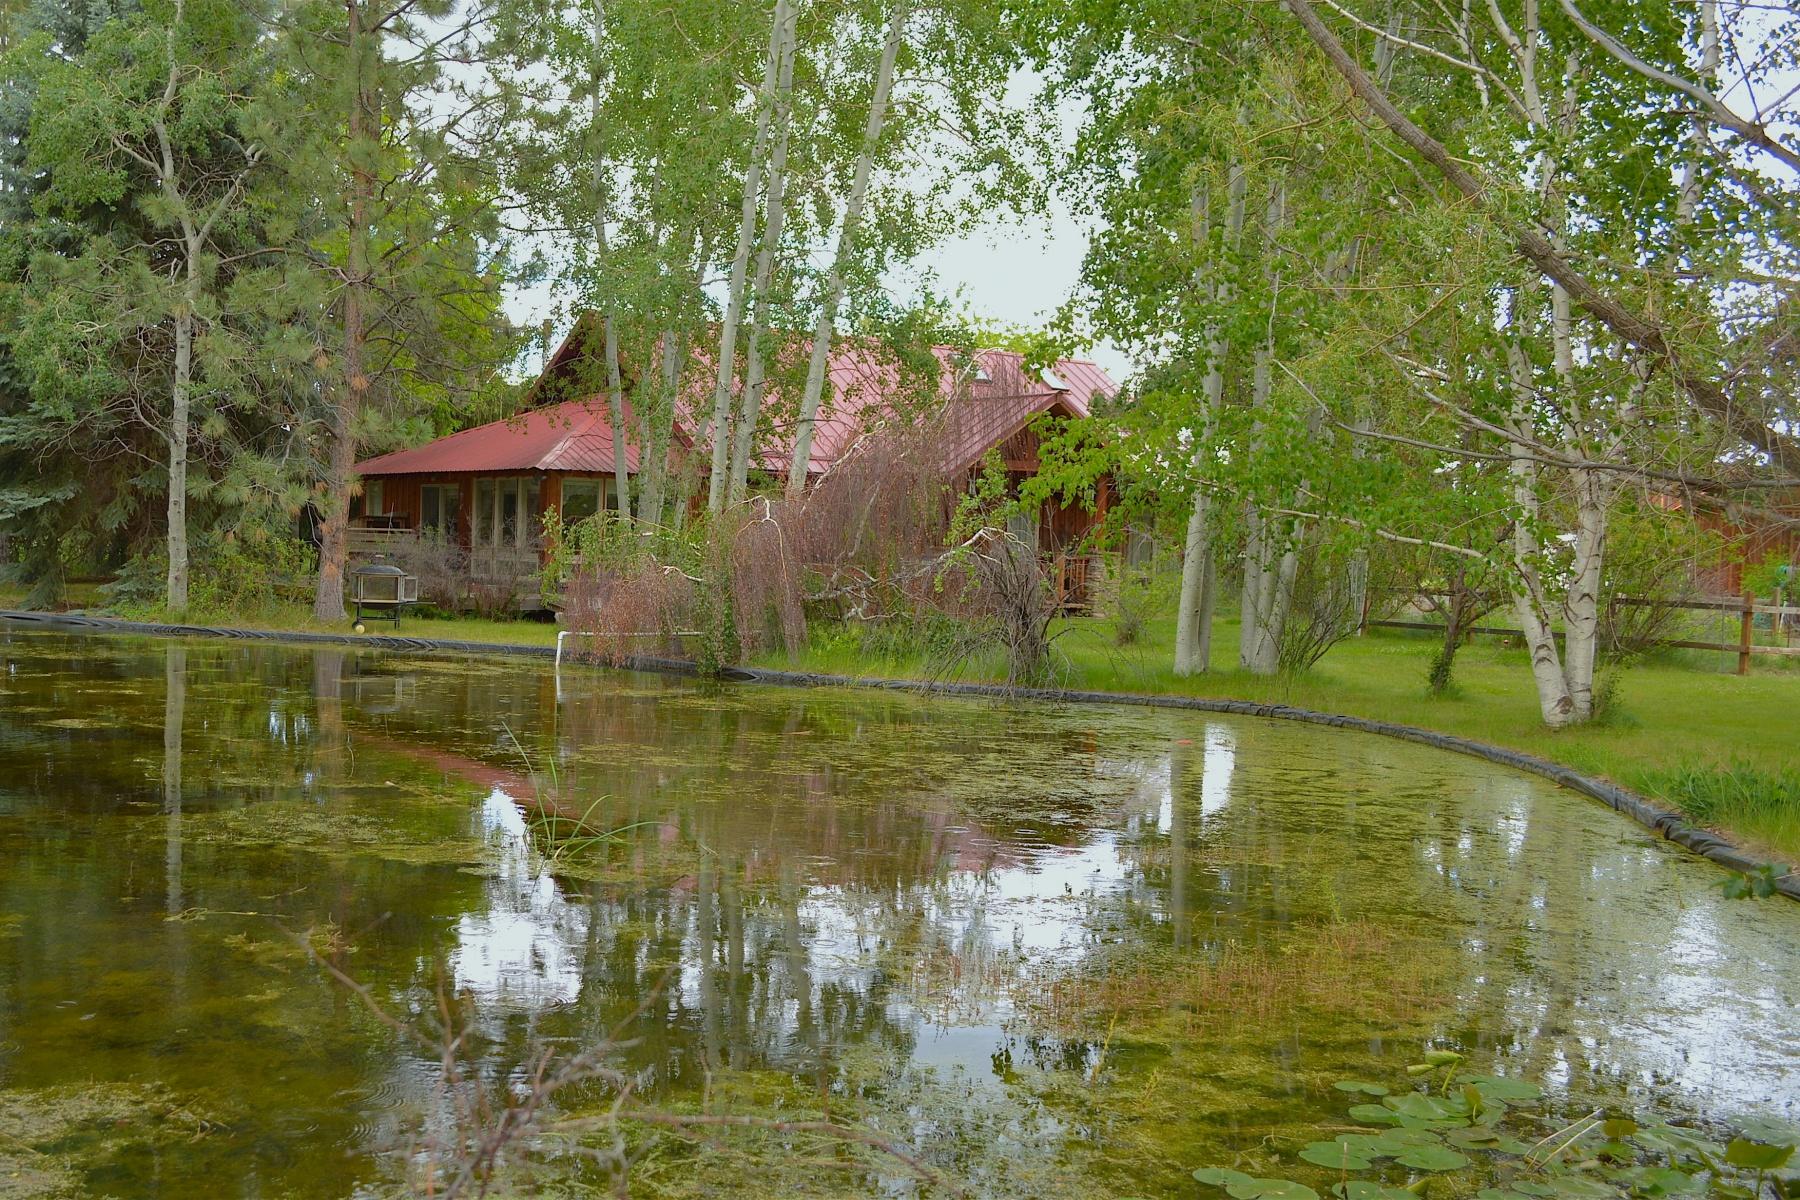 独户住宅 为 销售 在 20 Acre Hay Ranch- Parklike Setting 25360 Walker Rd 本德, 俄勒冈州, 97701 美国